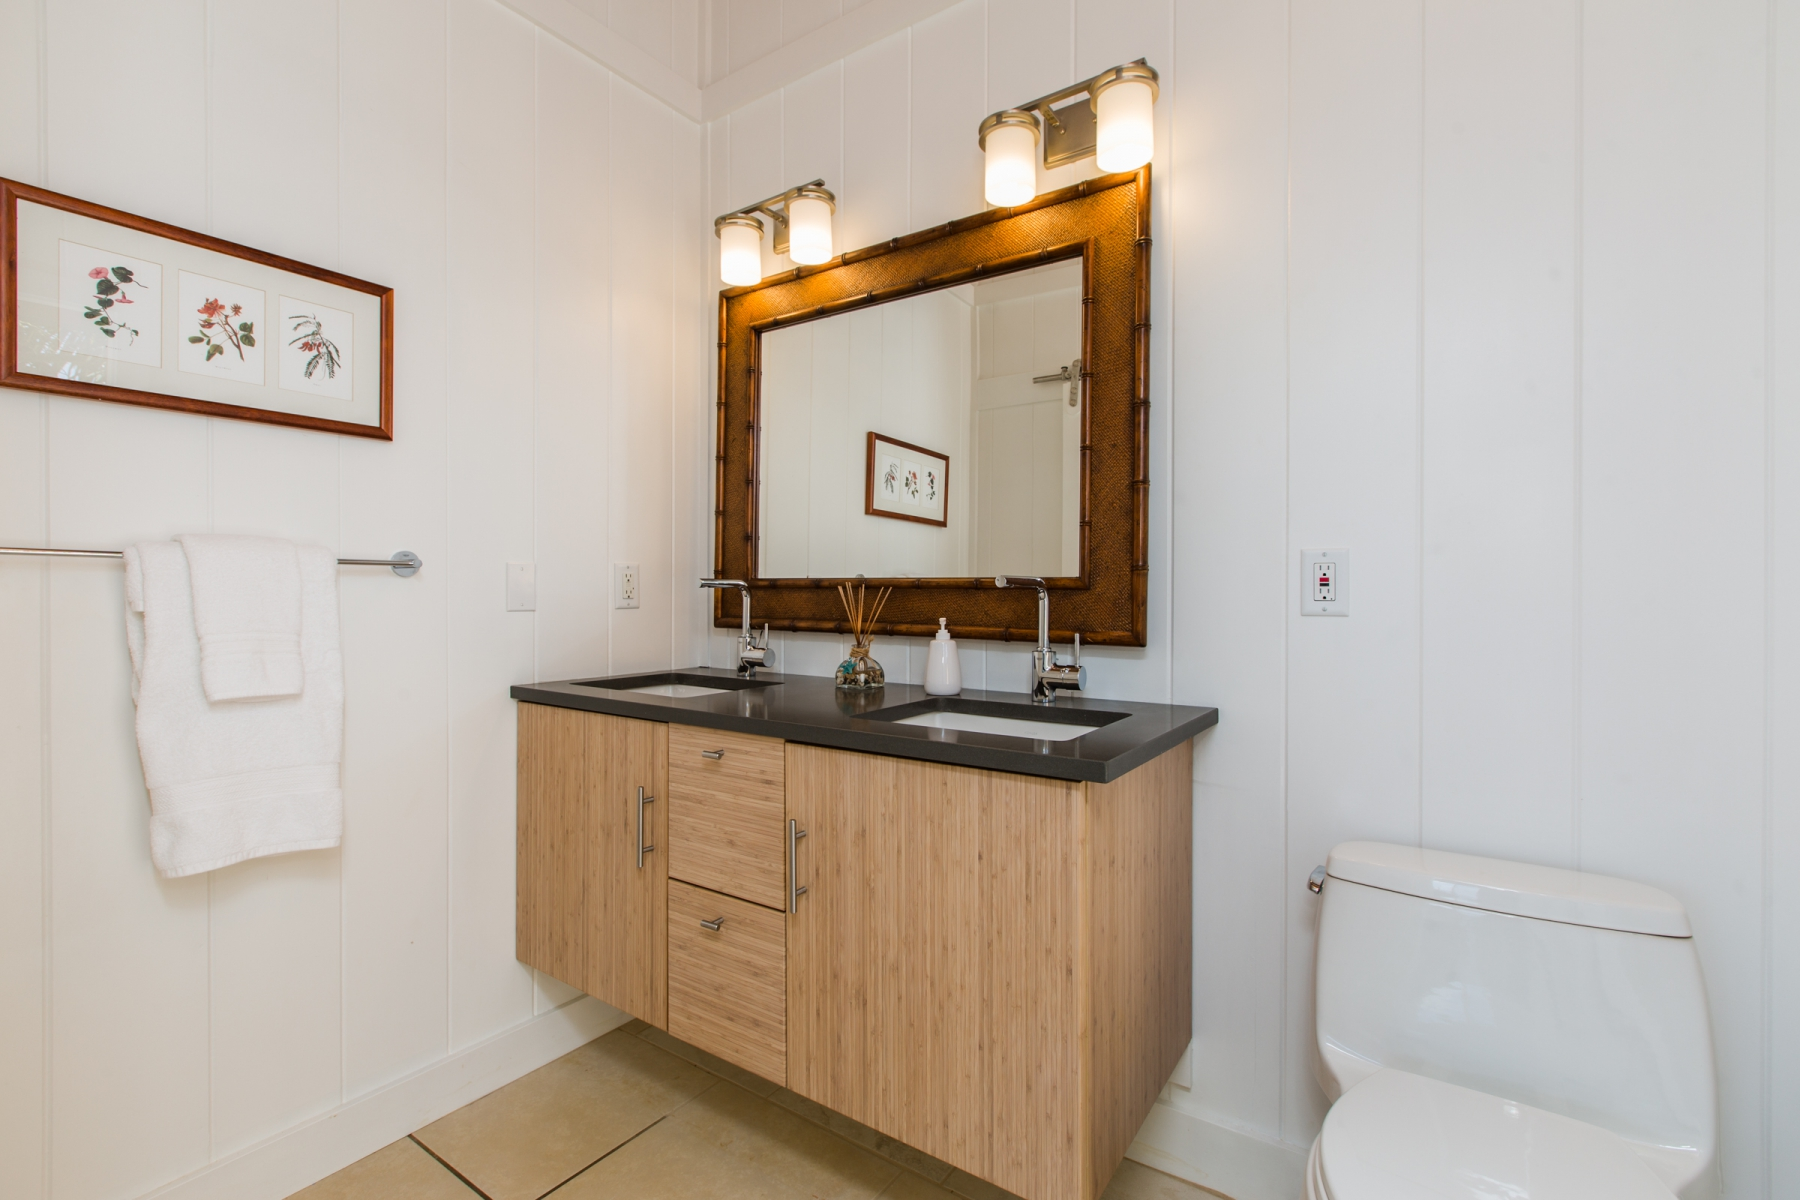 2nd-Bathroom.jpg_1800x1200_2194177.jpg